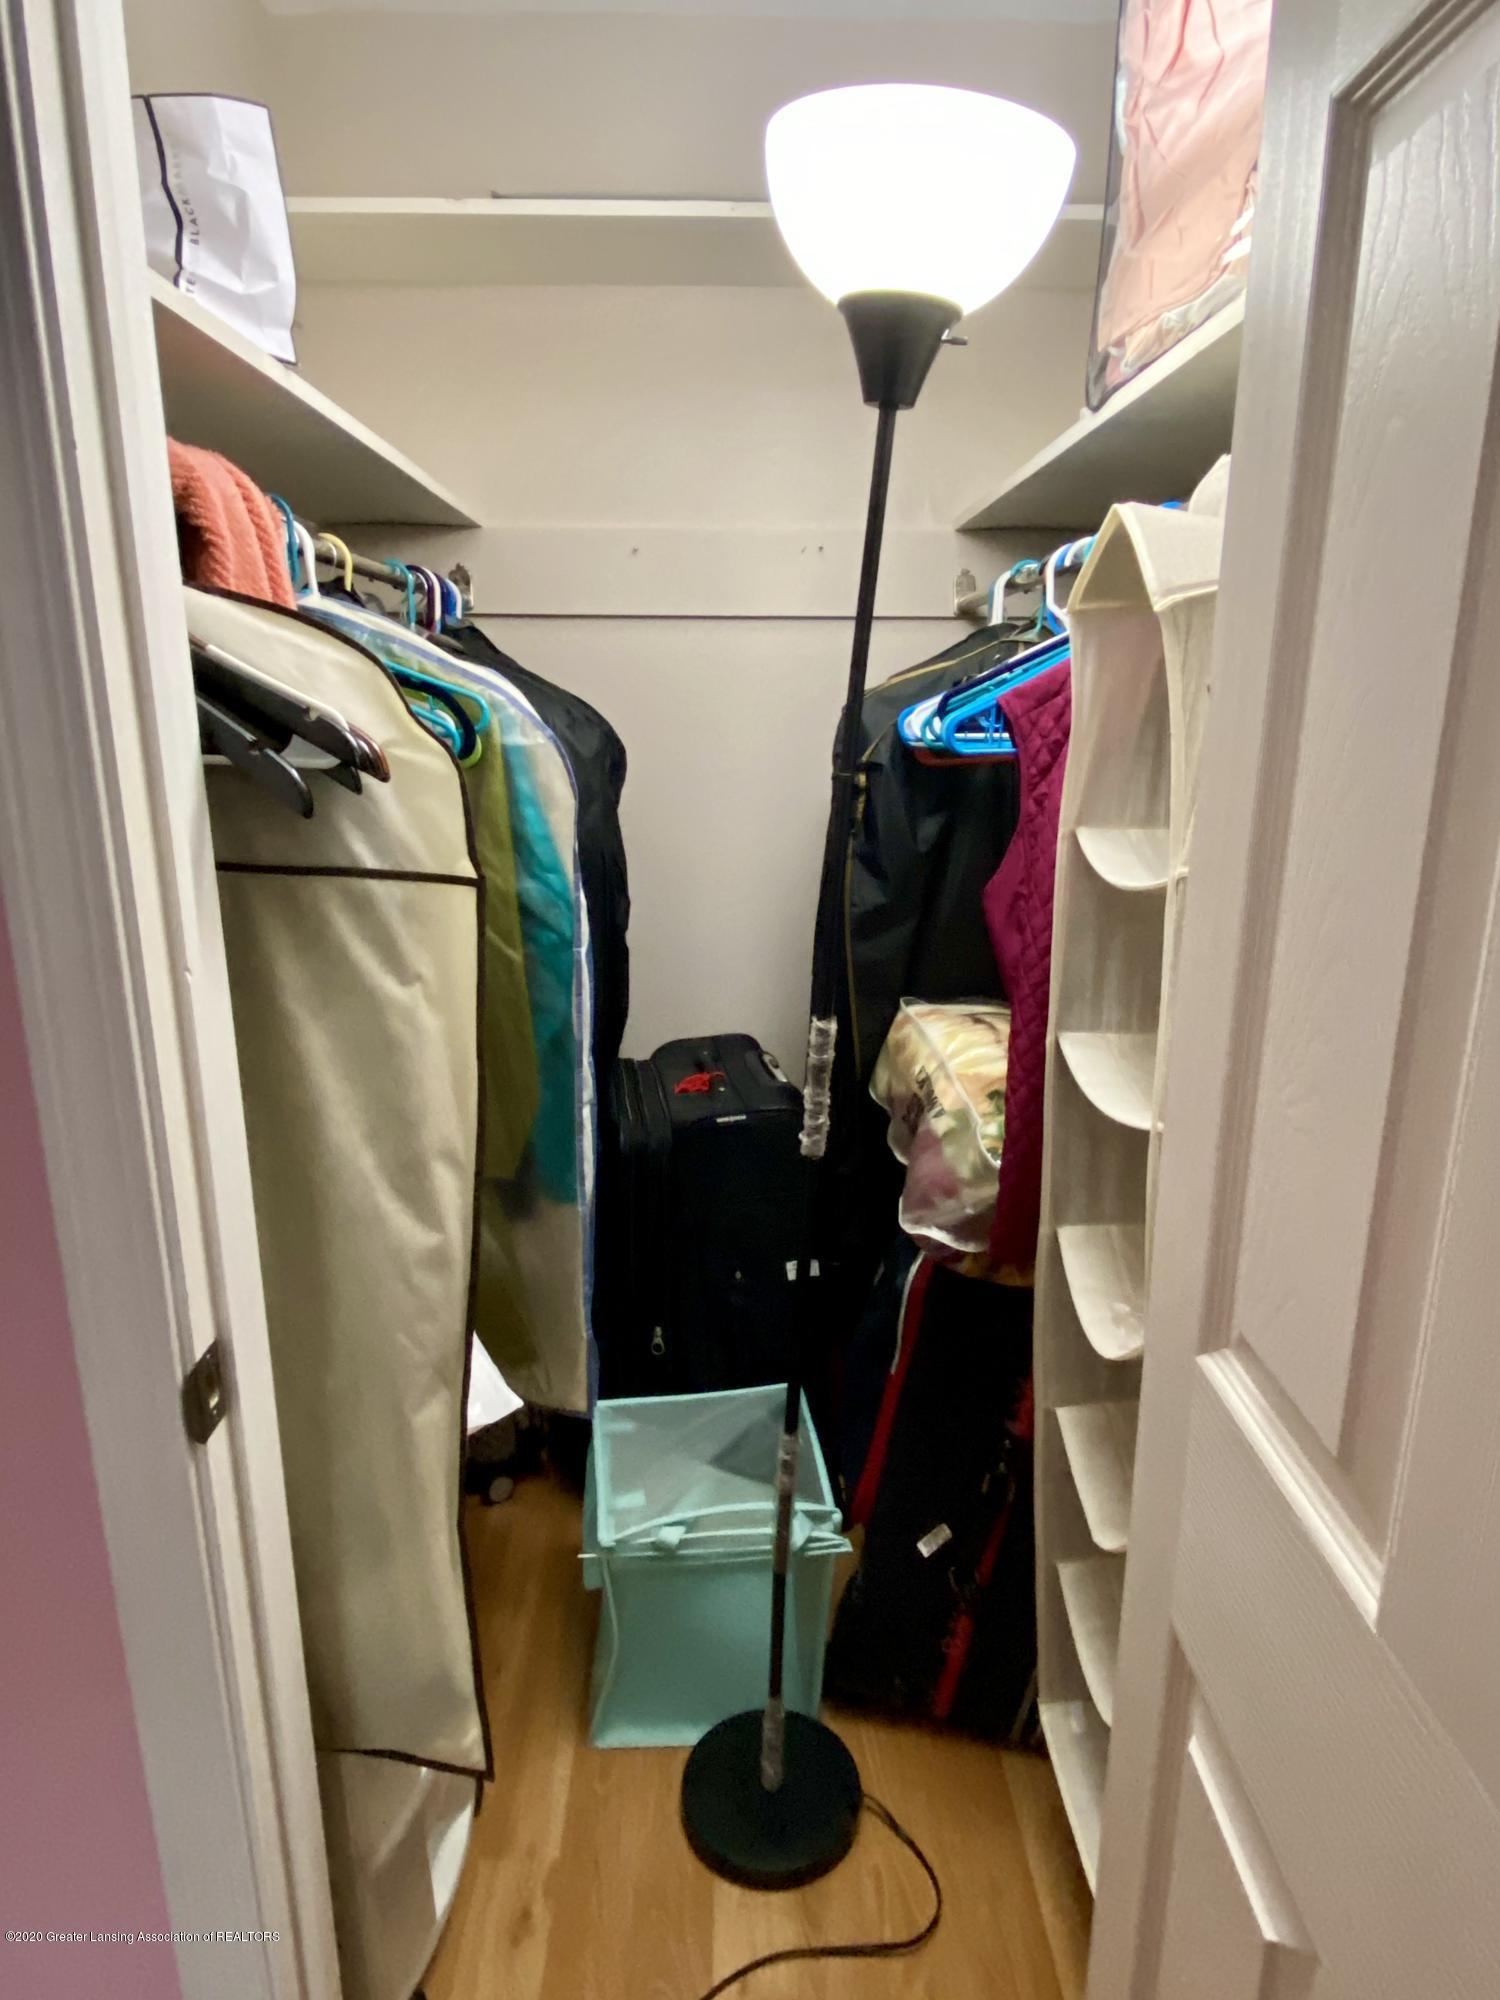 2024 Hamilton Rd 204 - Bedroom 2 - walkin closet - 15